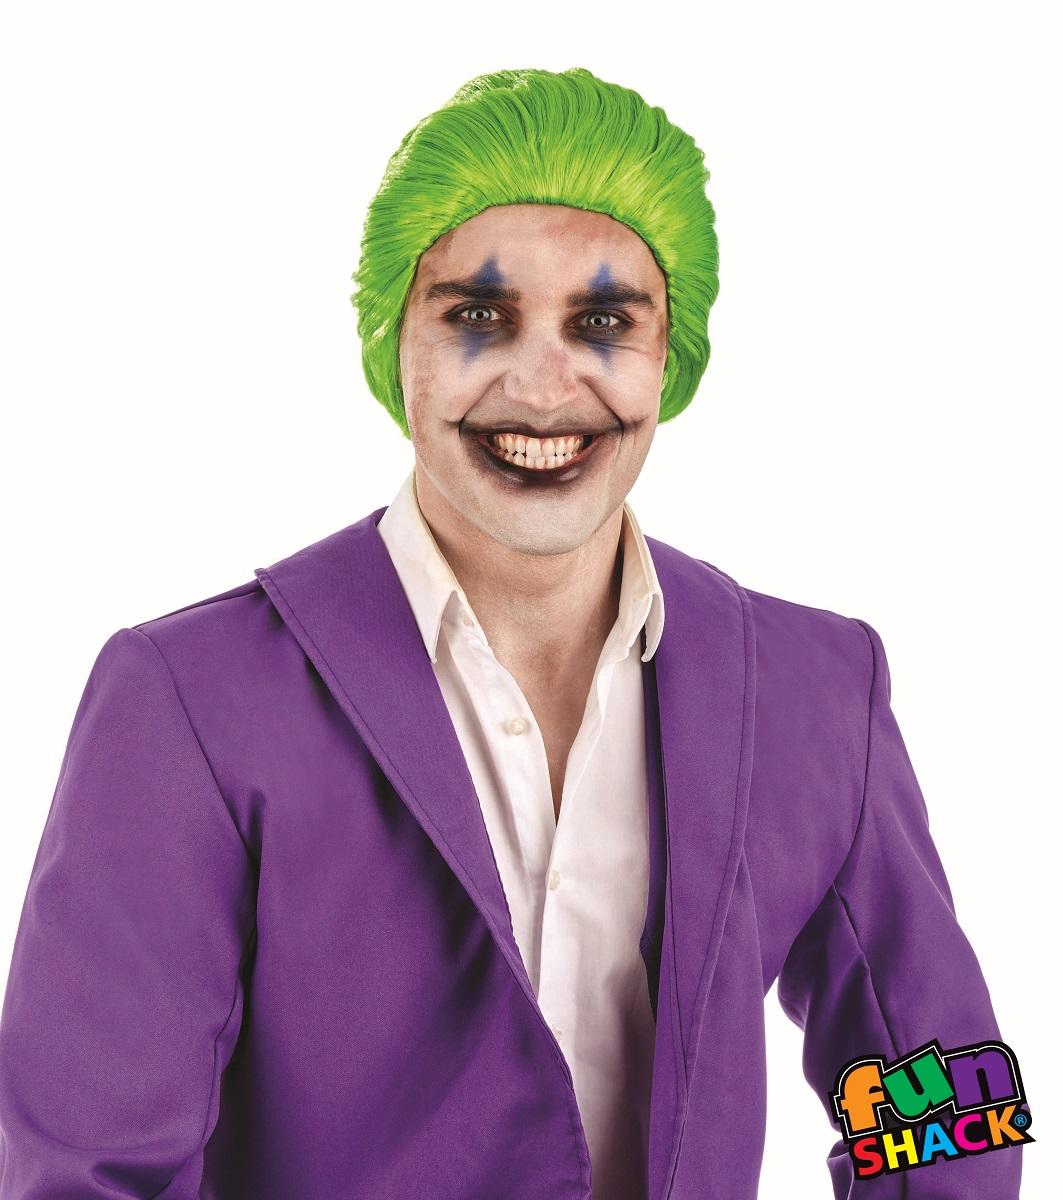 Green Men's Wig